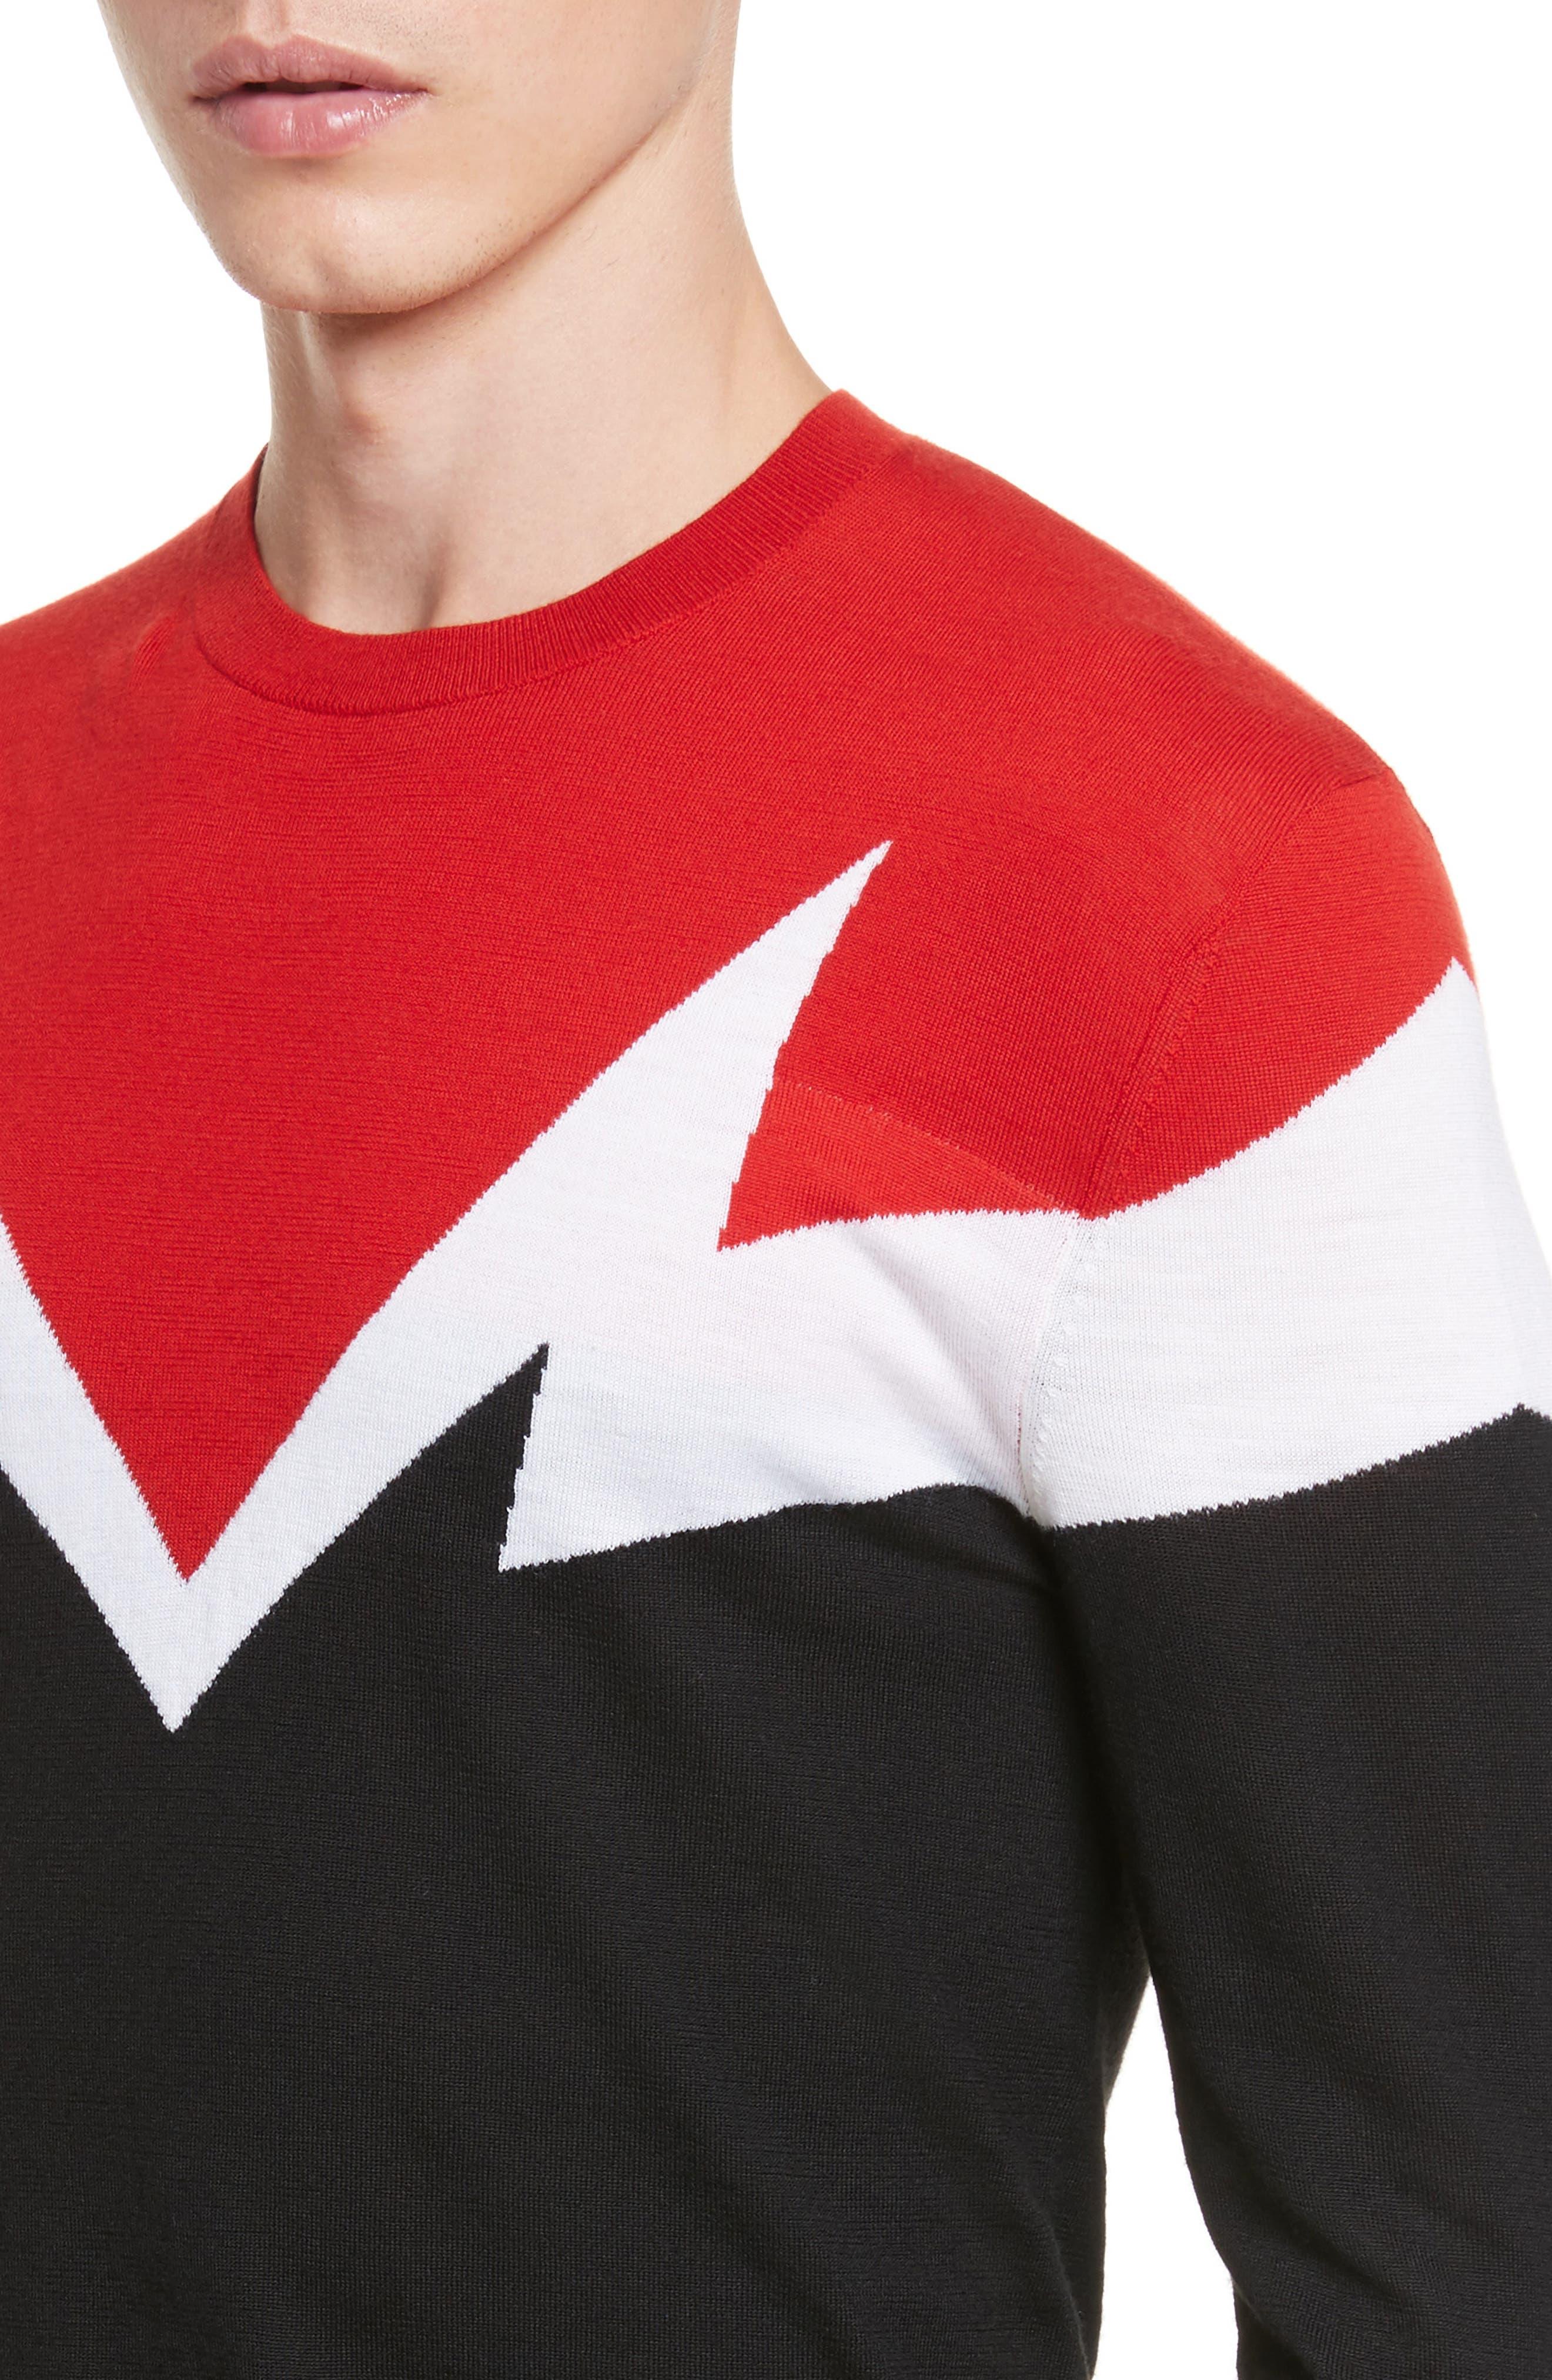 Colorblock Thunderbolt Merino Wool Sweater,                             Alternate thumbnail 4, color,